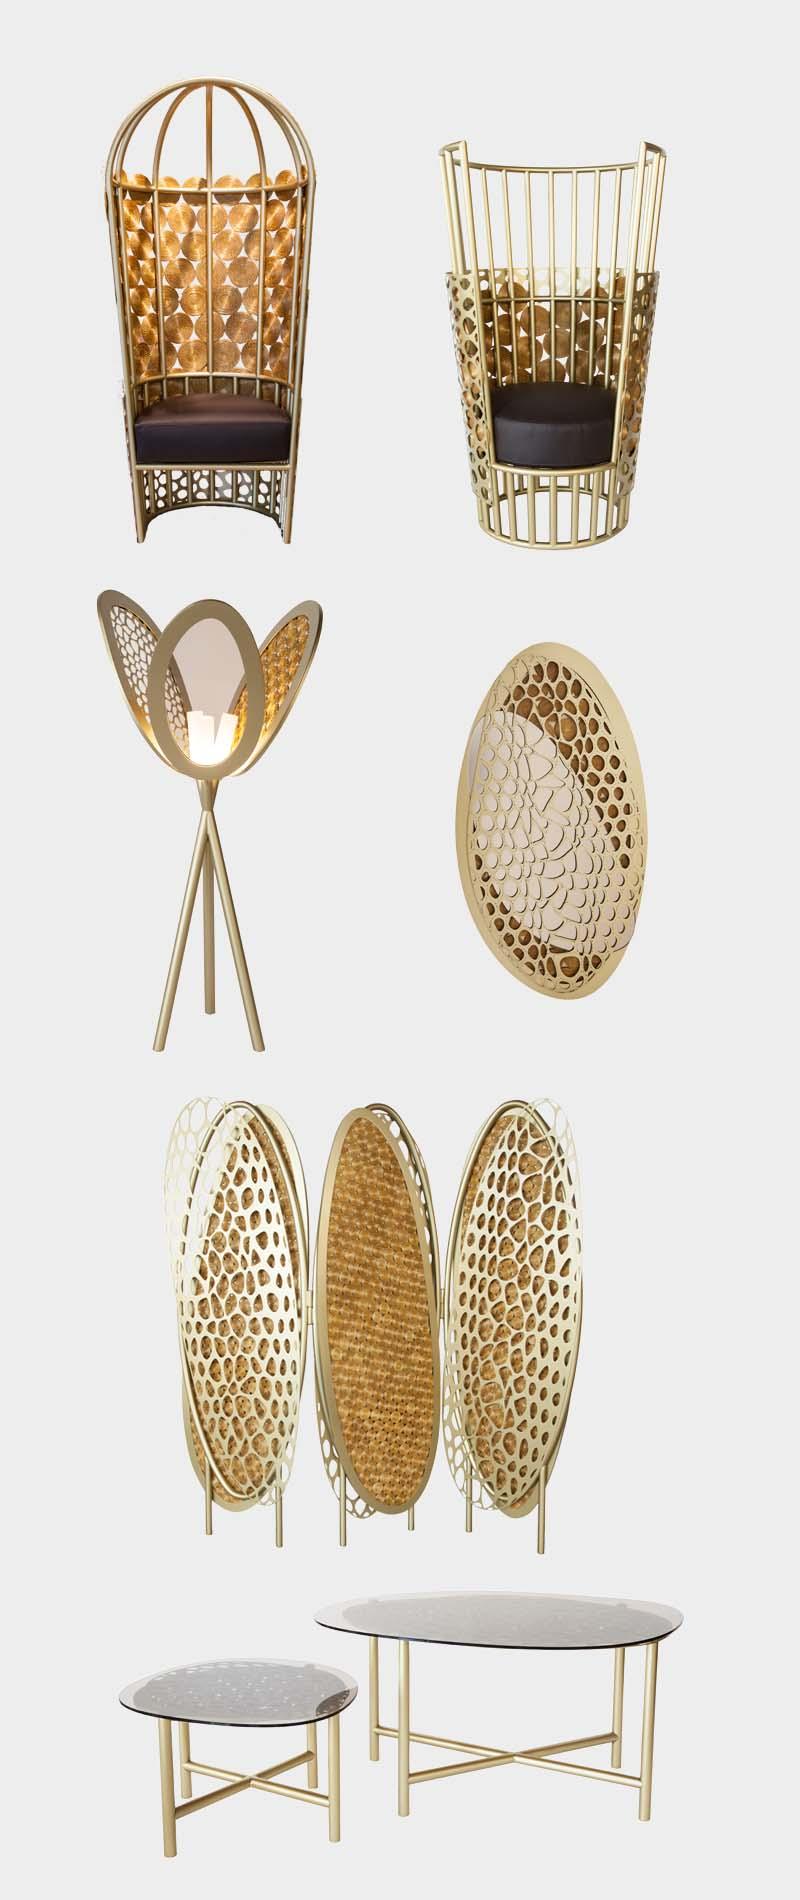 04-golden-harvest-collection-guto-requena